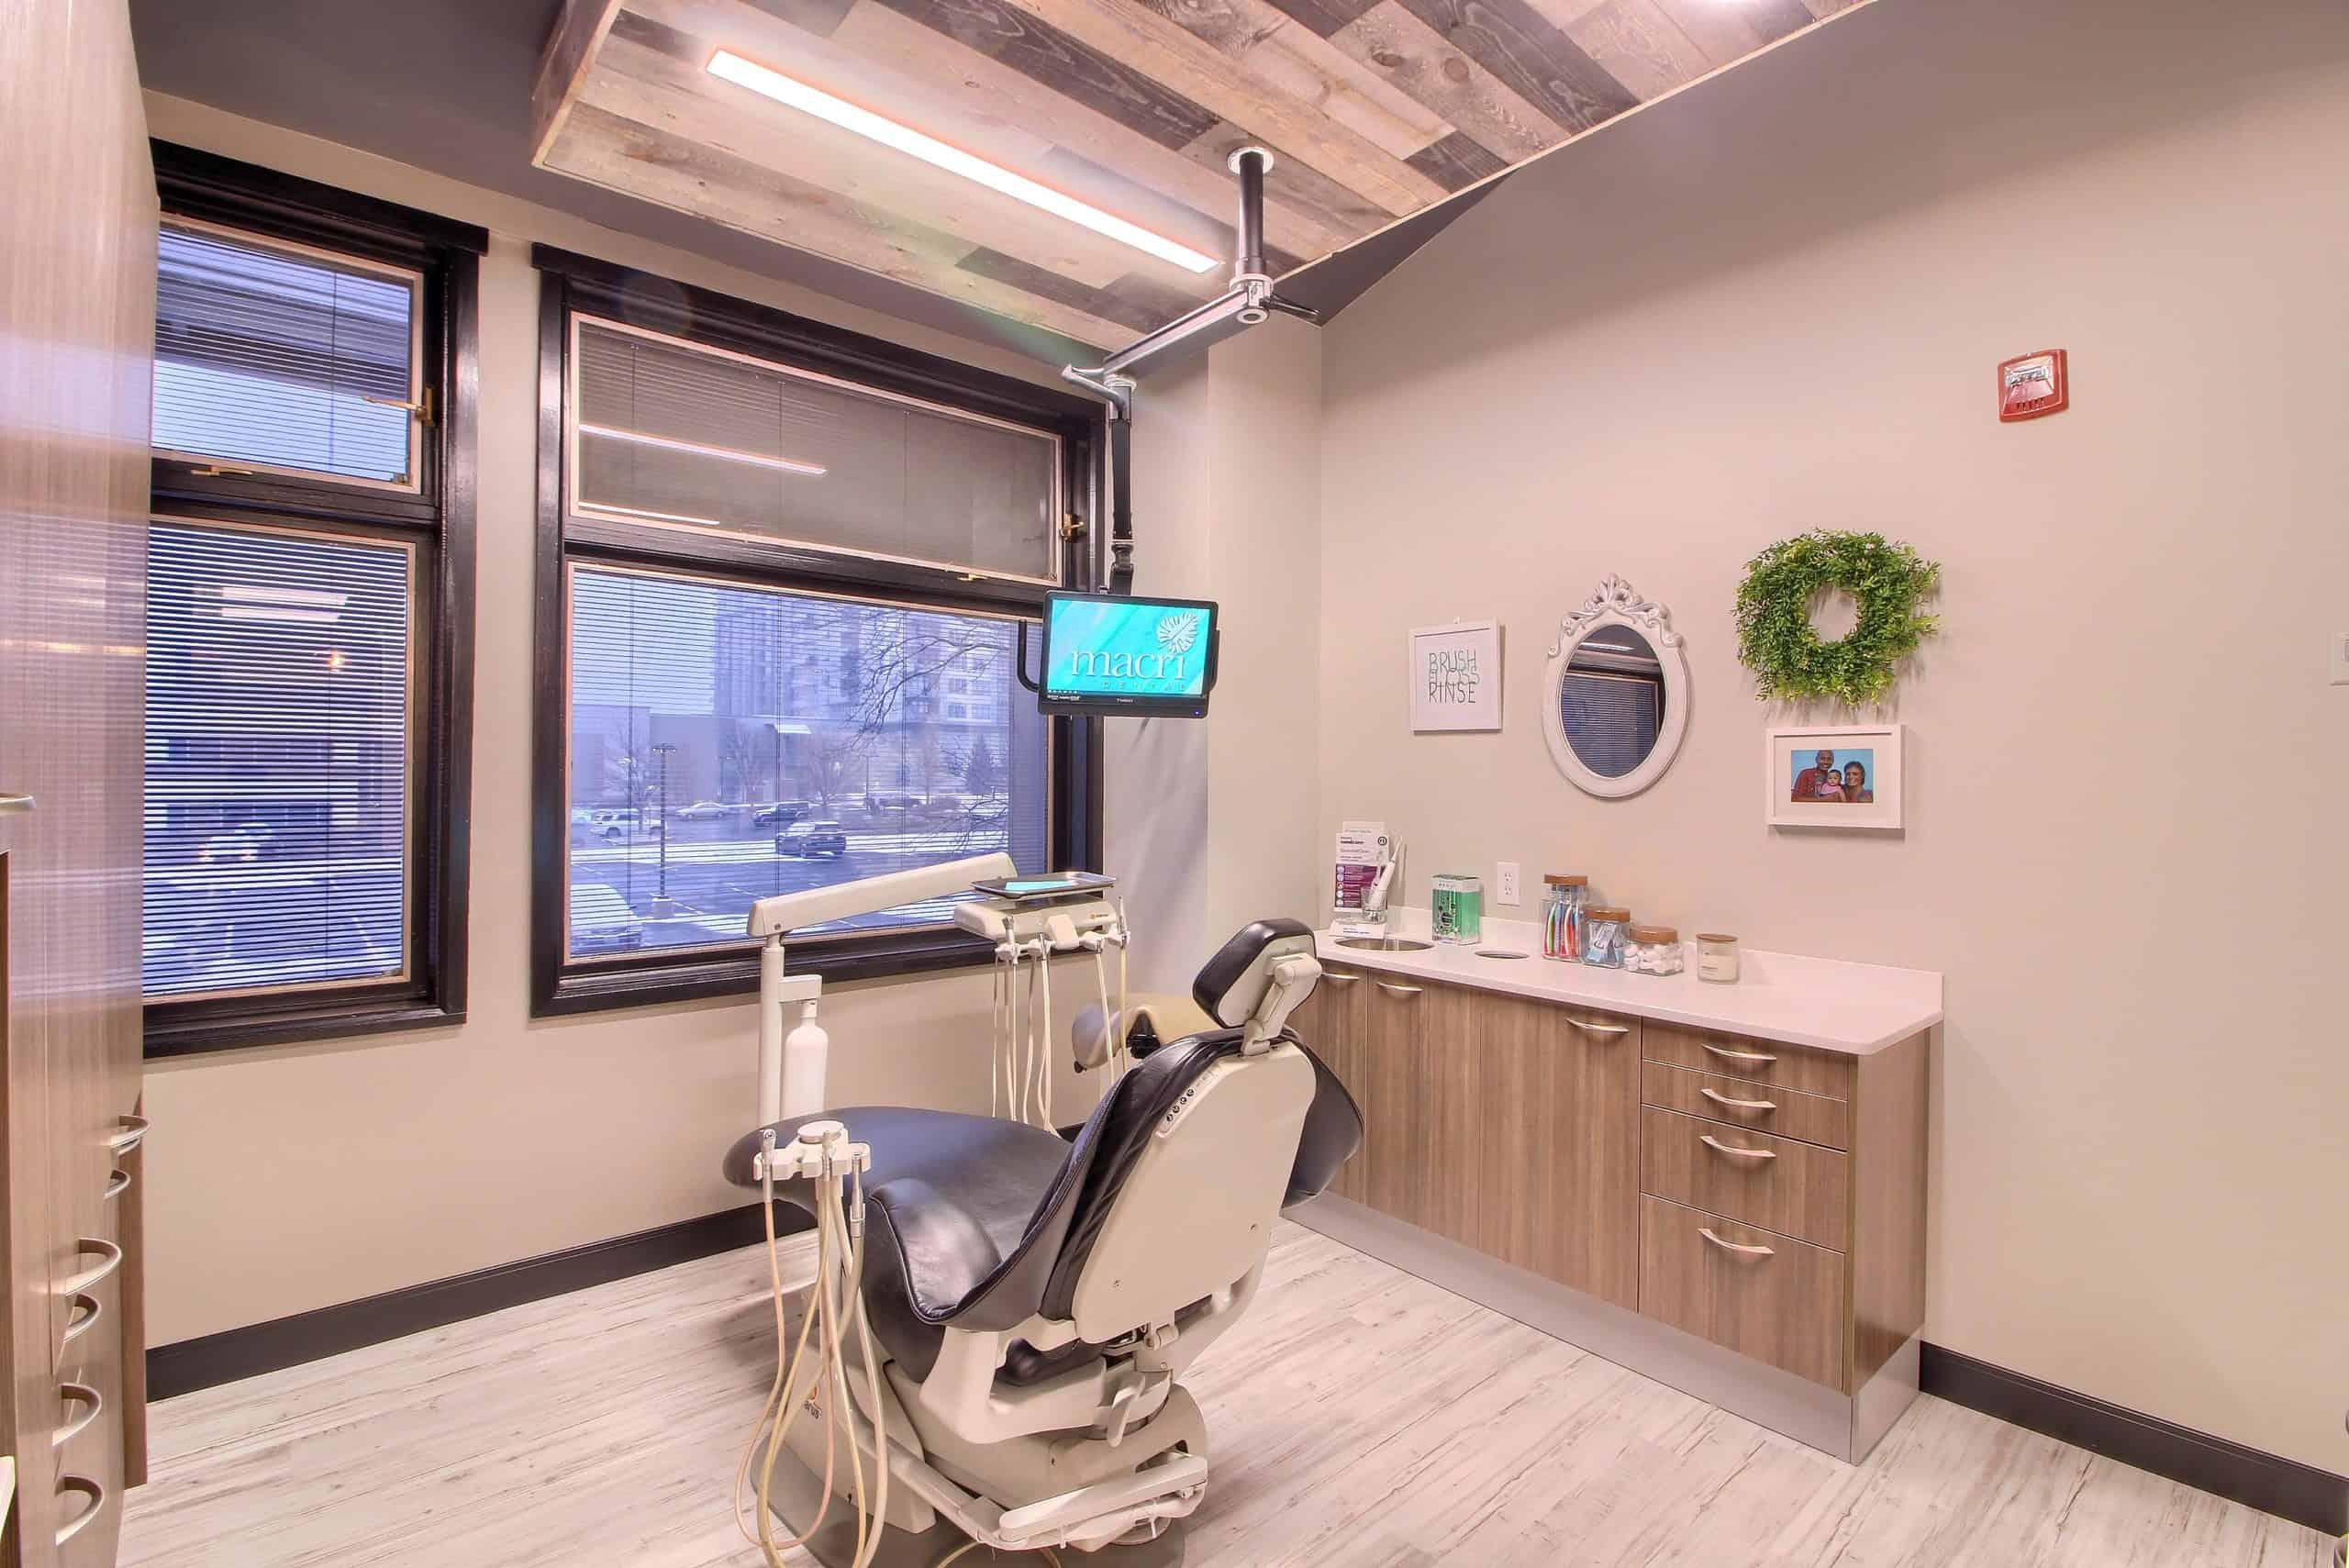 Macri Dental in Greenwood Village